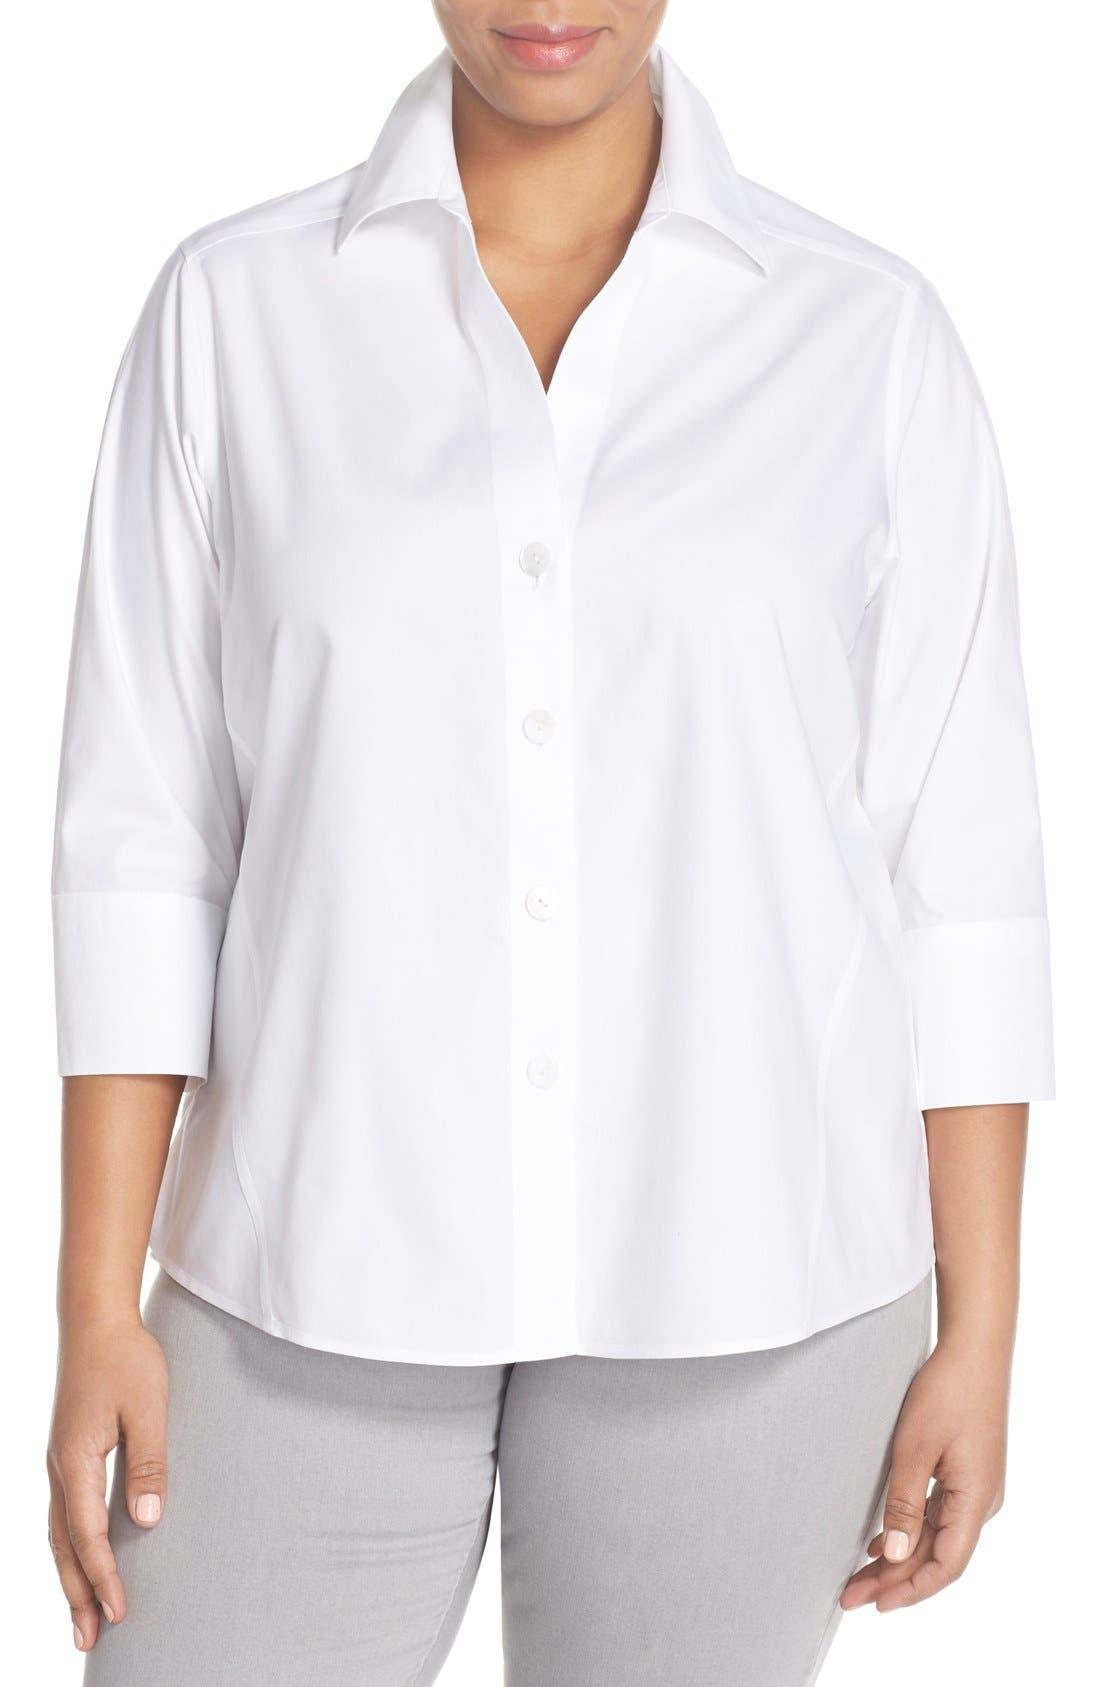 Paige Non-Iron Cotton Shirt,                             Main thumbnail 1, color,                             WHITE